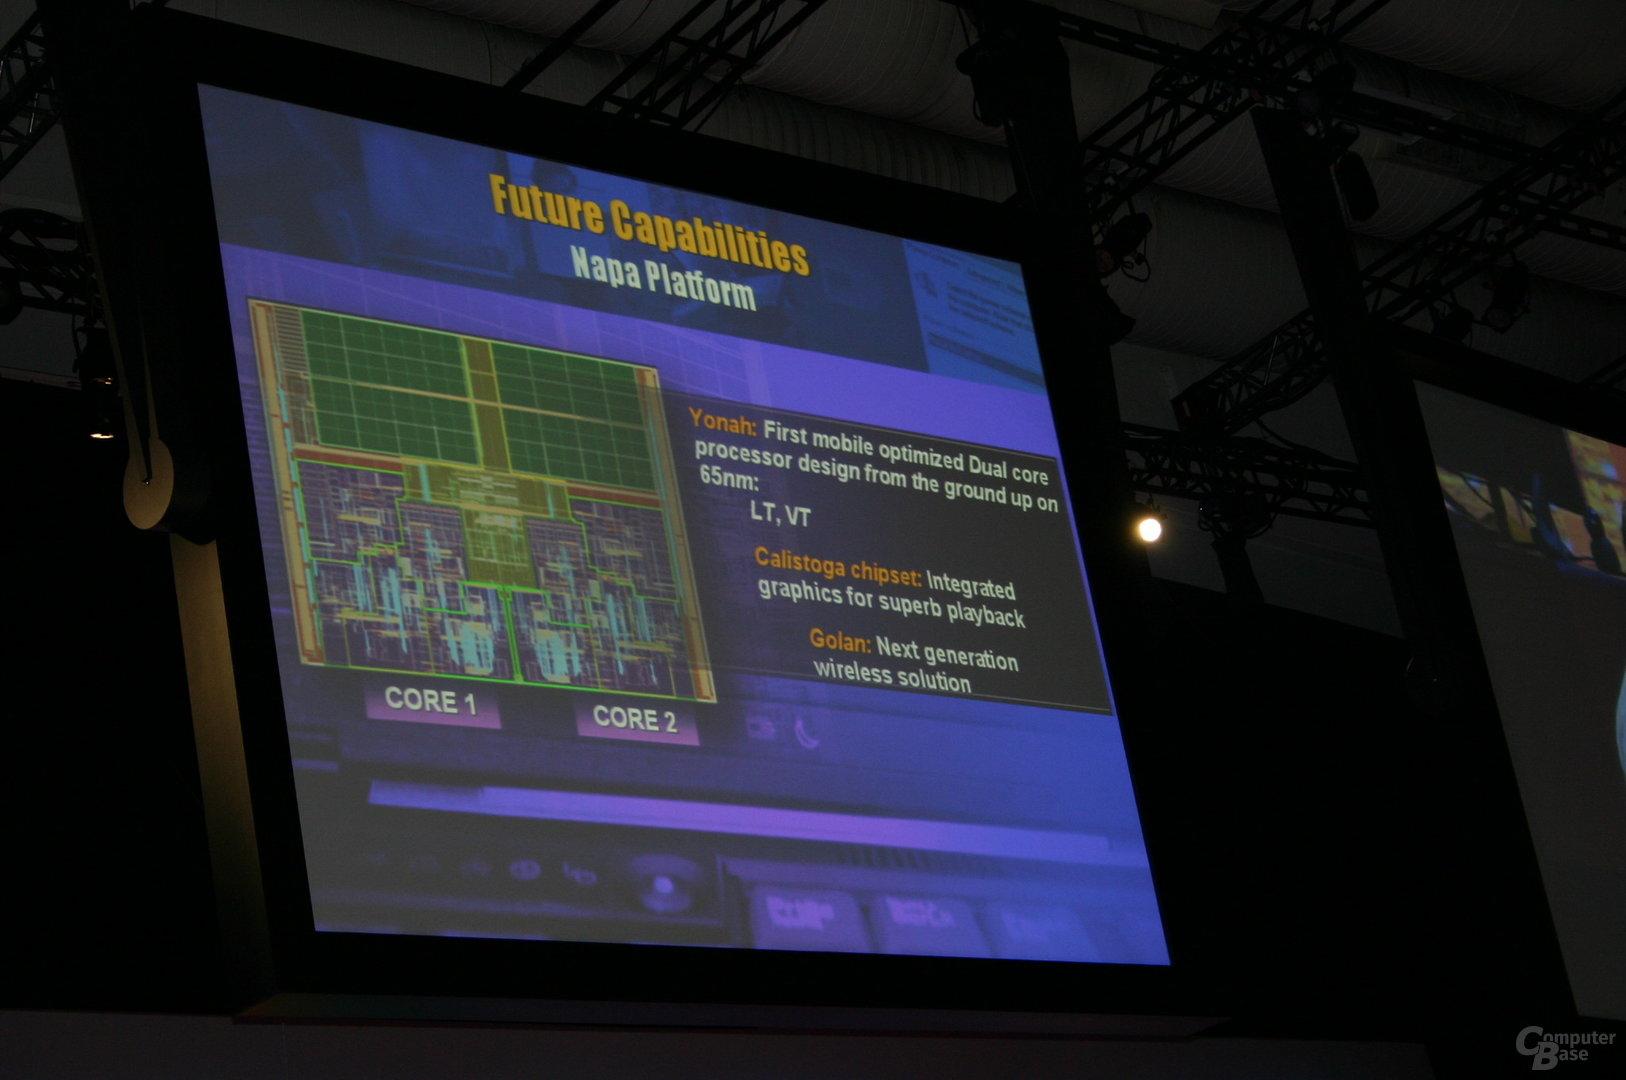 Intels Napa Plattform